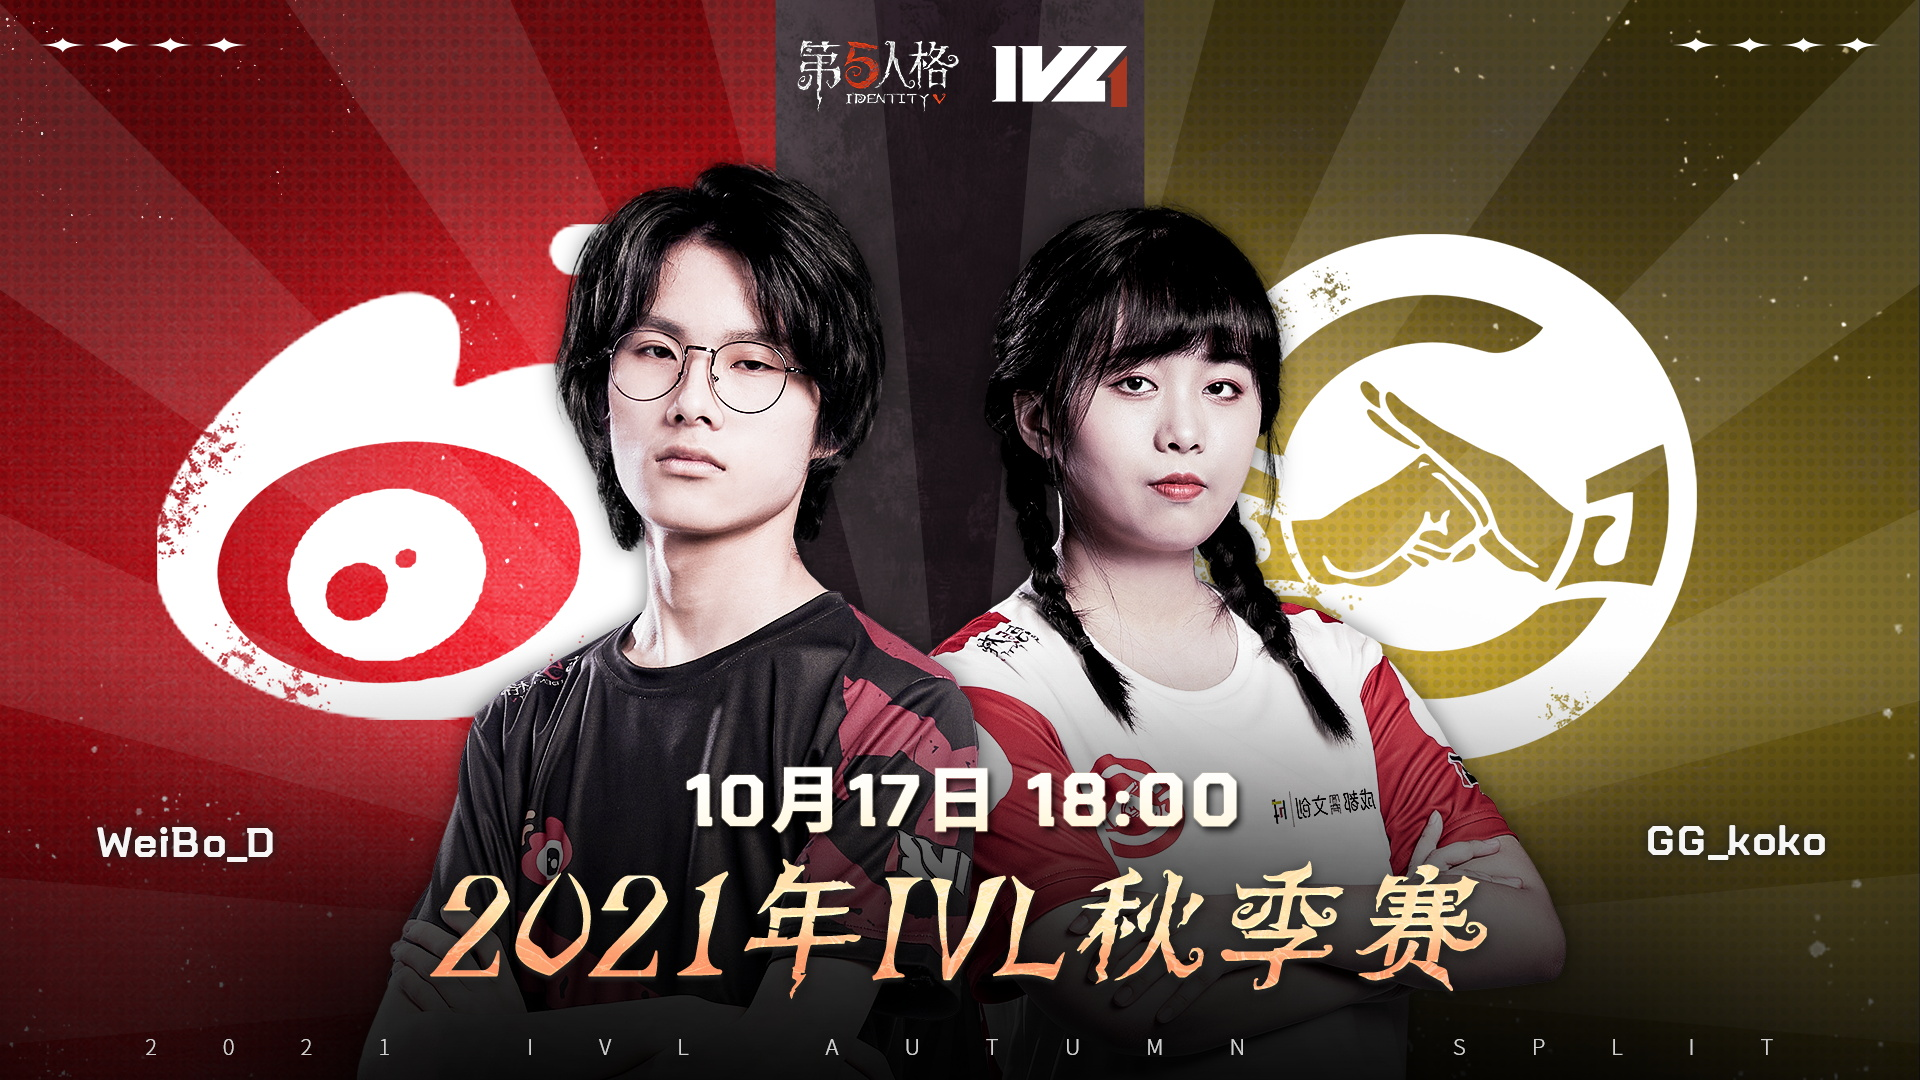 【2021IVL】秋季赛W1D3录像 Weibo vs GG